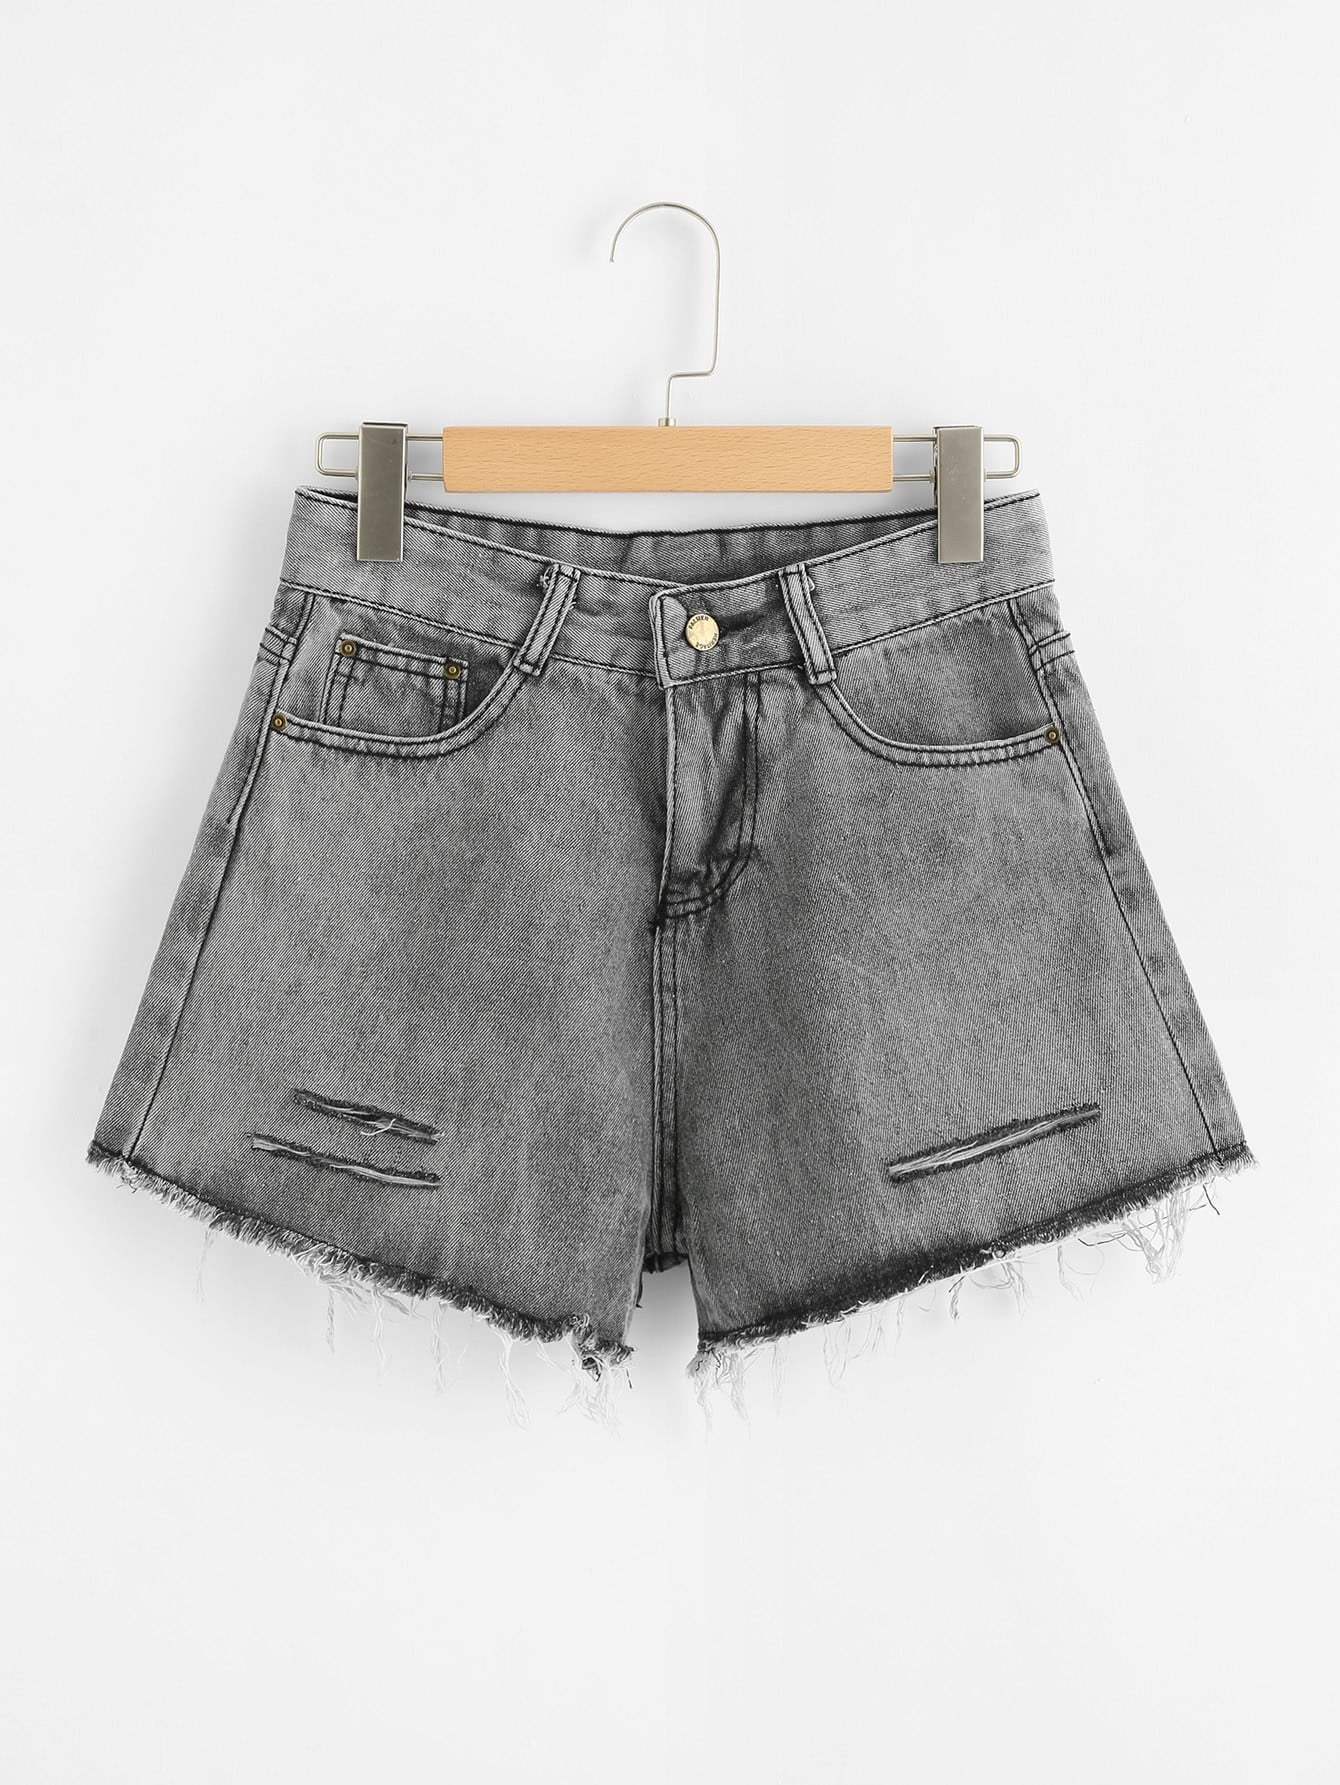 Bleach Wash Raw Hem Denim Shorts stylish women s lace embellised bleach wash denim shorts